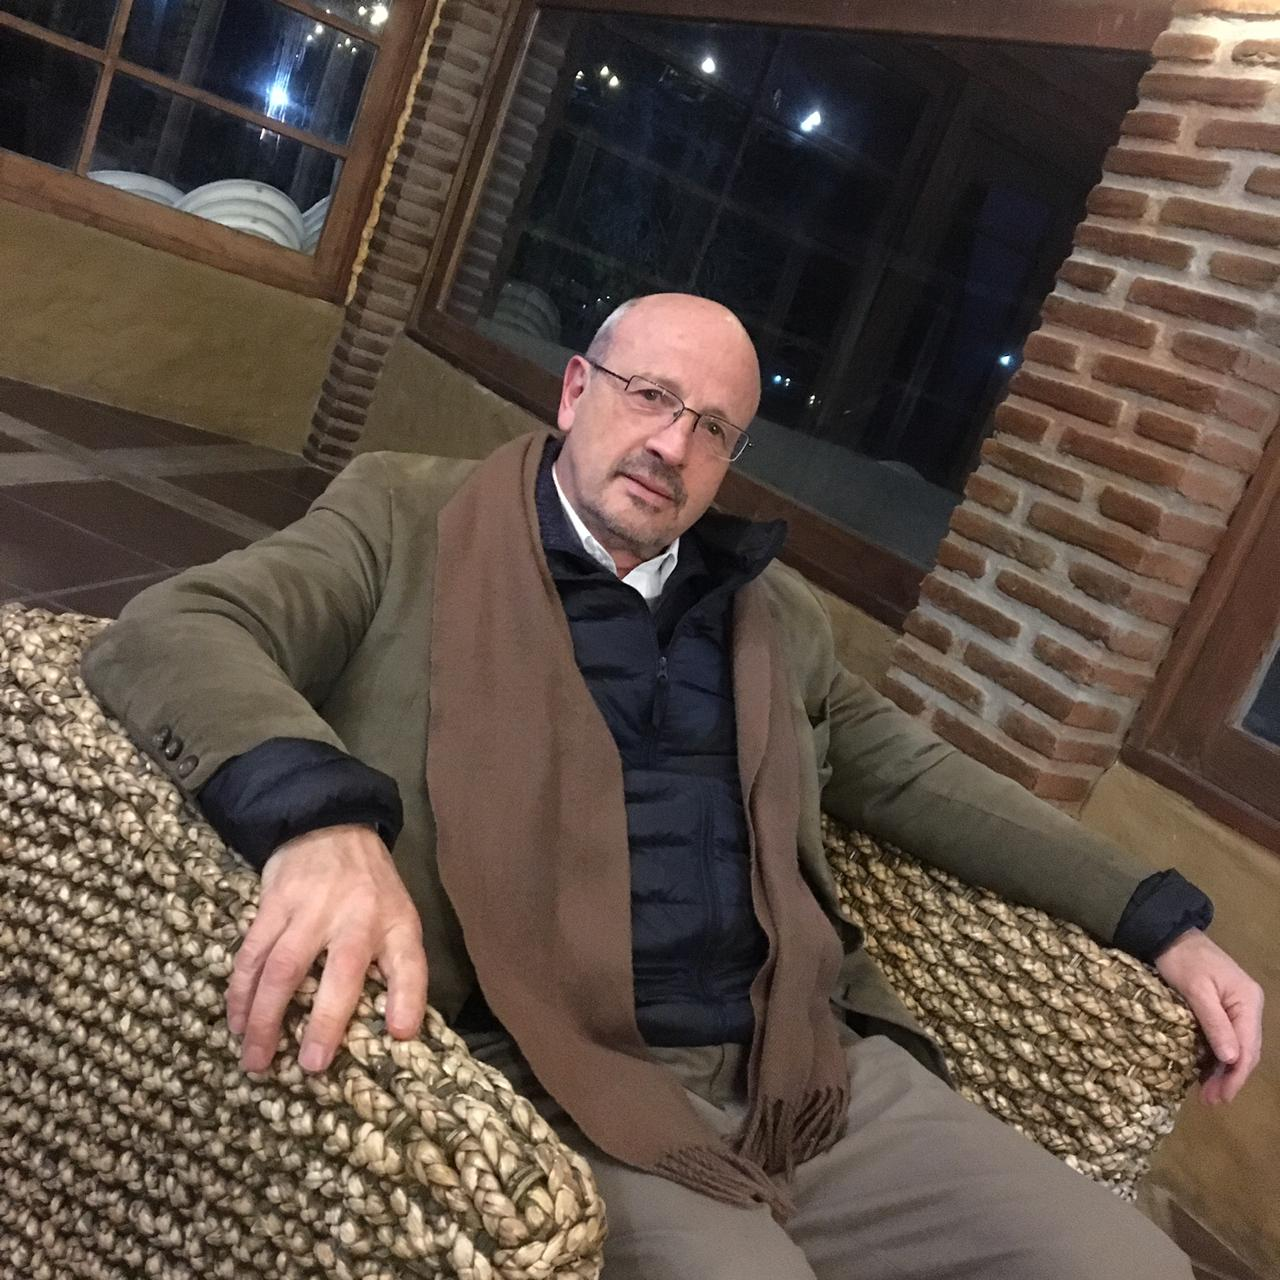 Georges Bonan – Empoderando desde coopetencia en turismo